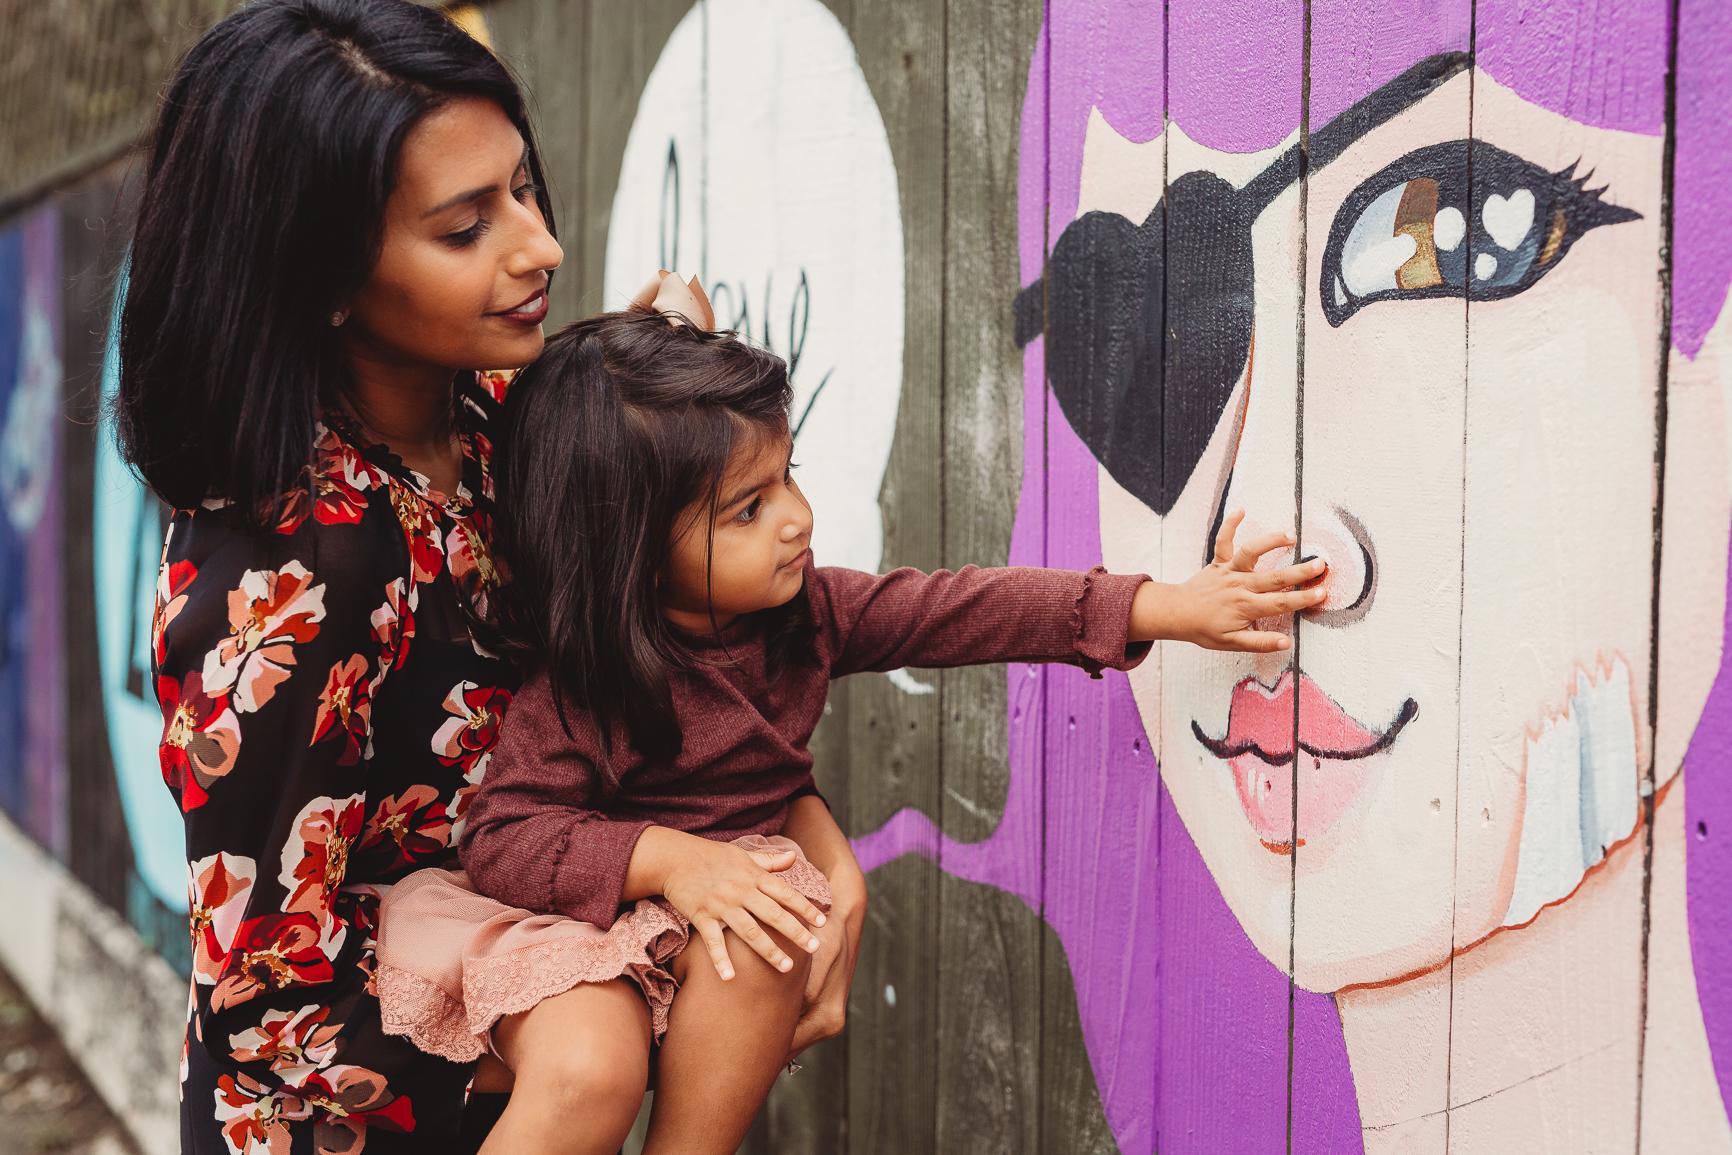 Jesrani-Family-Gallery-Kali-Mikelle-46.jpg